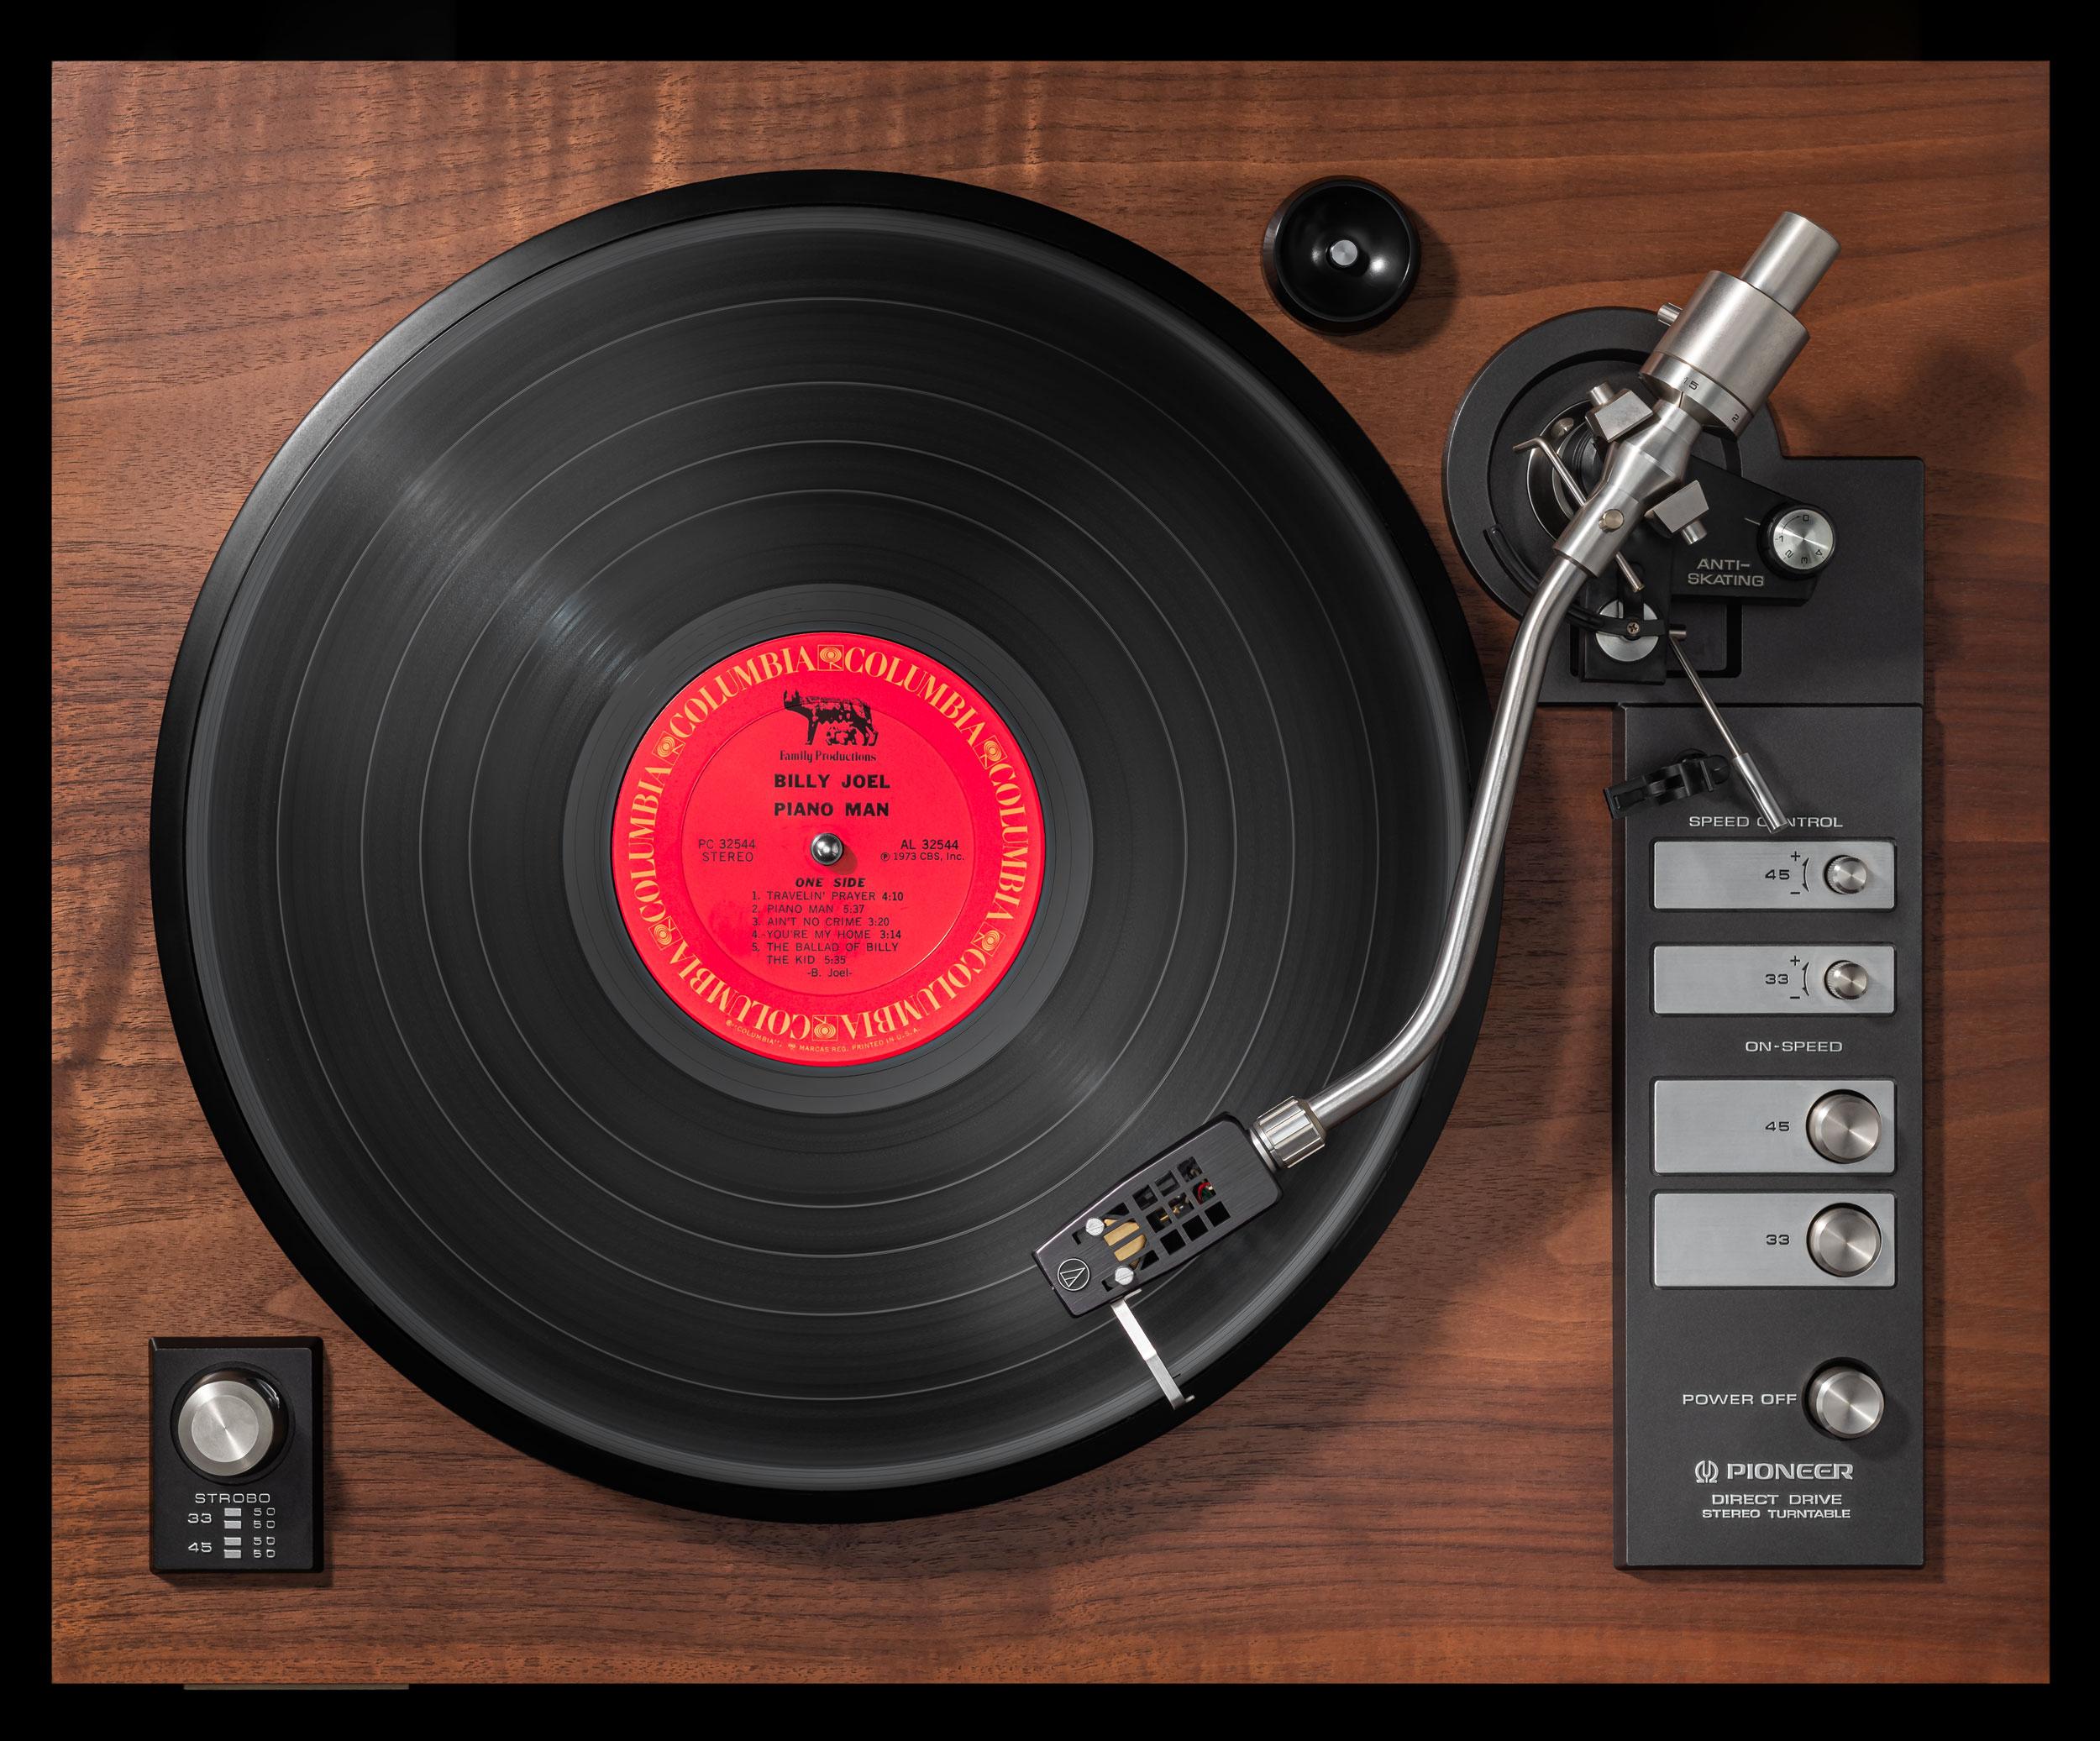 Vinylography No. 4 Billy Joel Piano Man on Pioneer PL 71